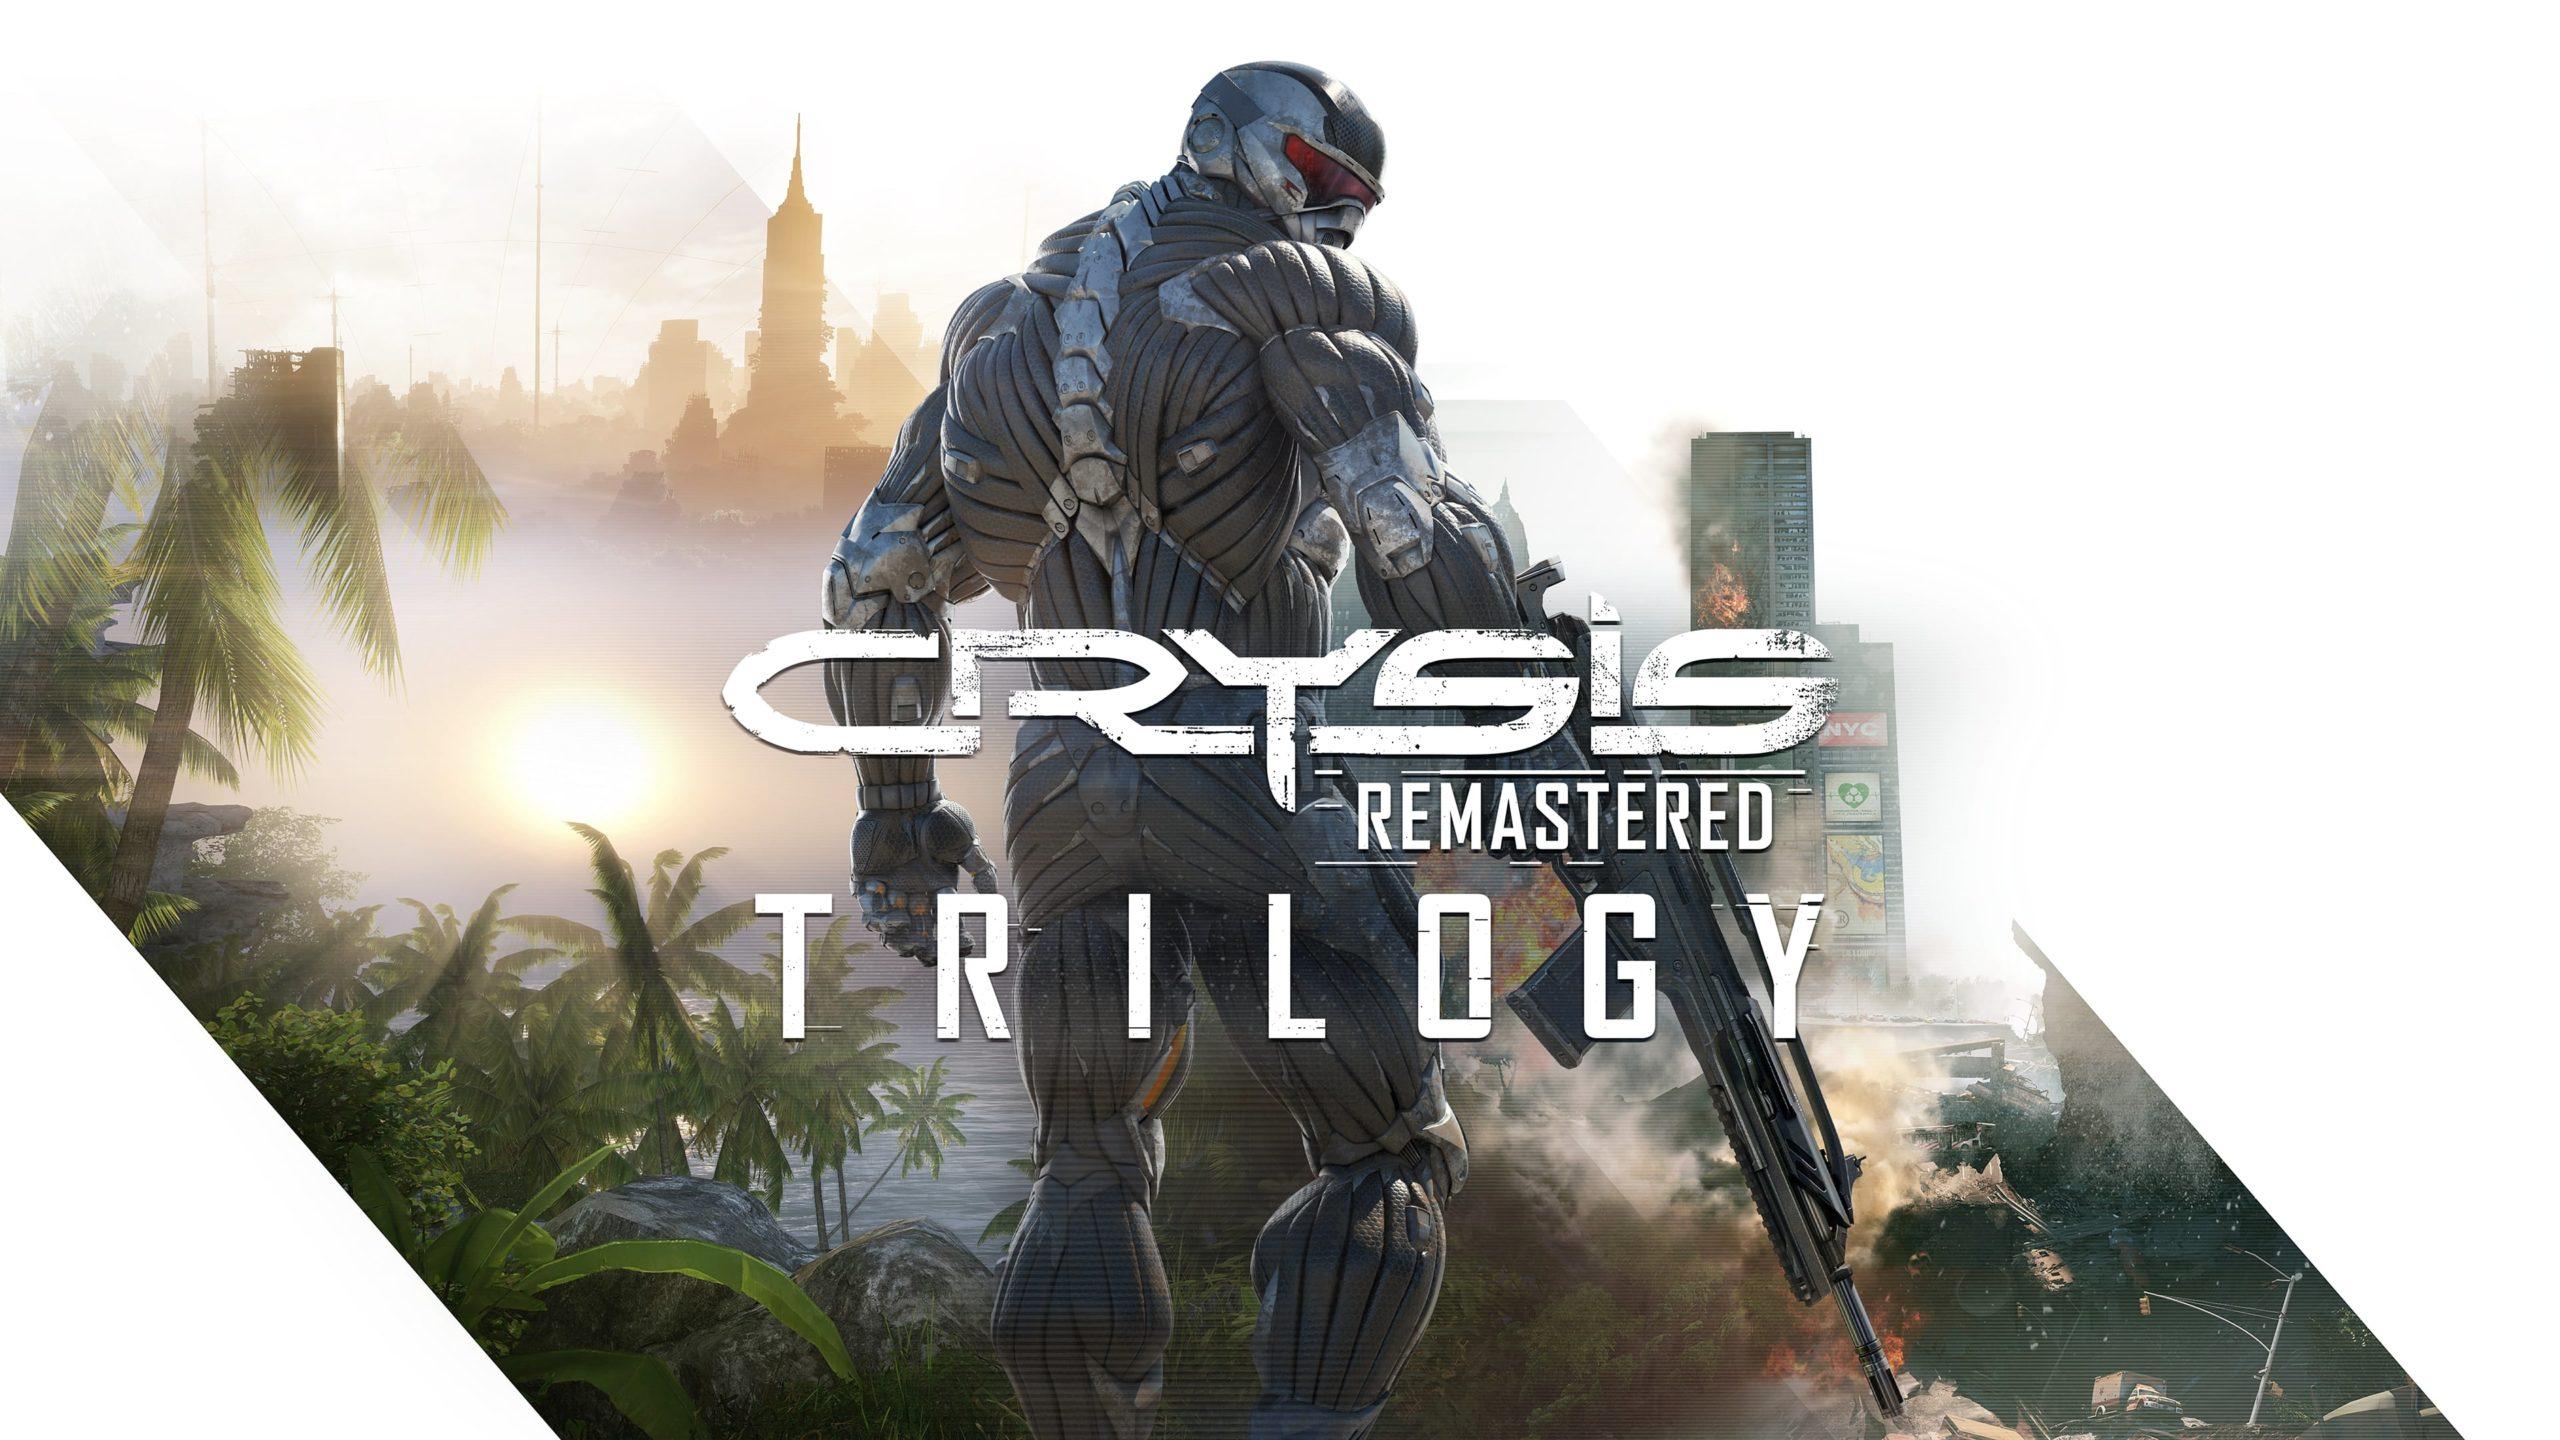 Crysis Remastered Trilogy